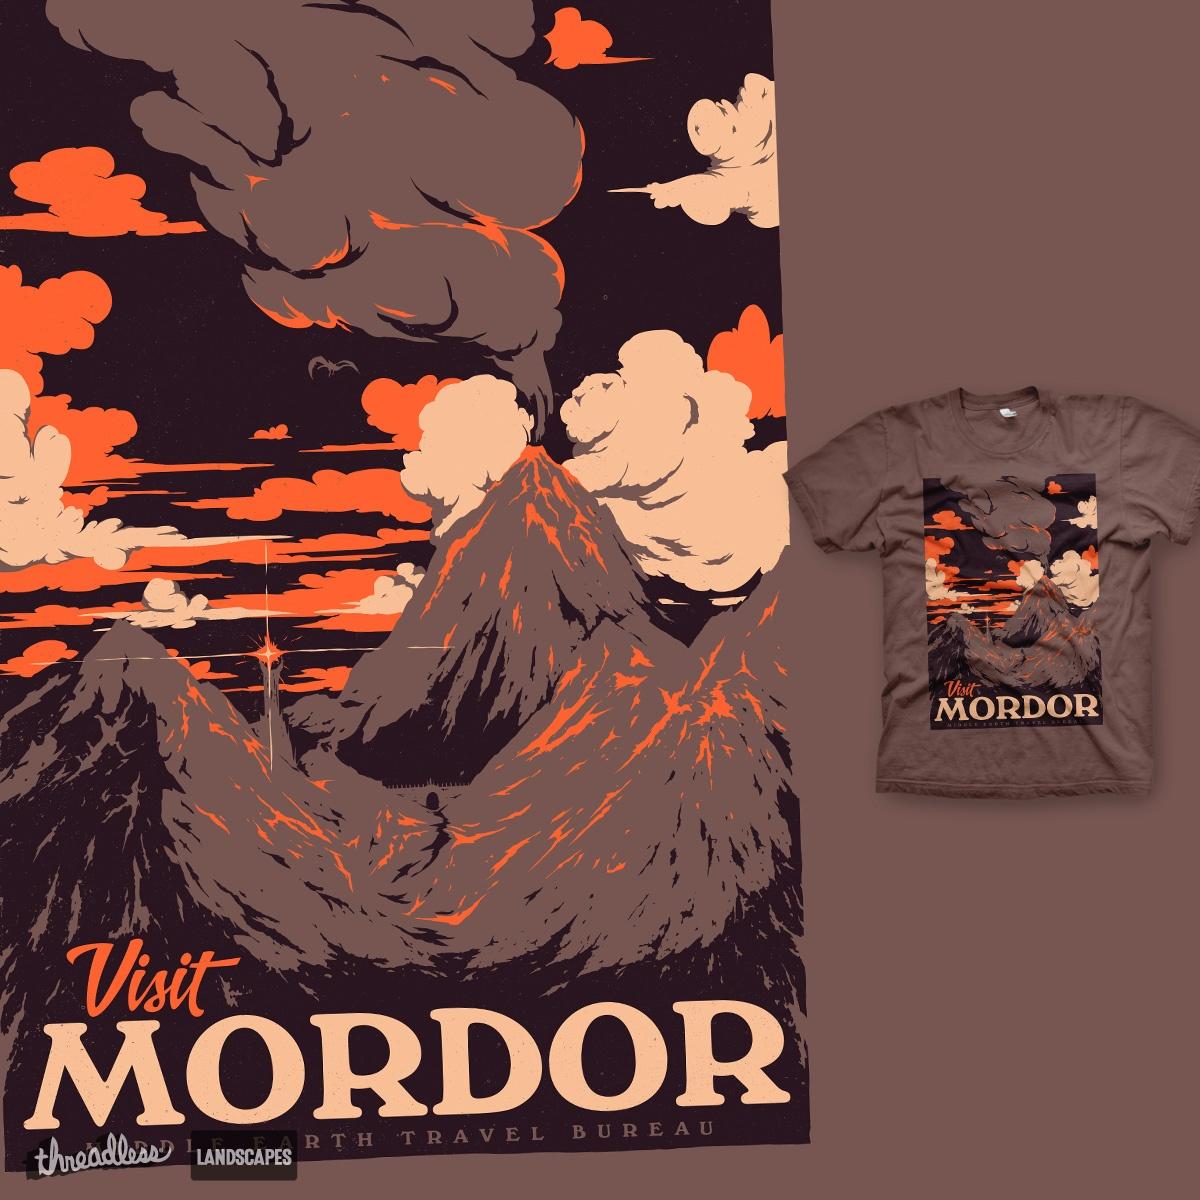 Vist Mordor by mathiole on Threadless